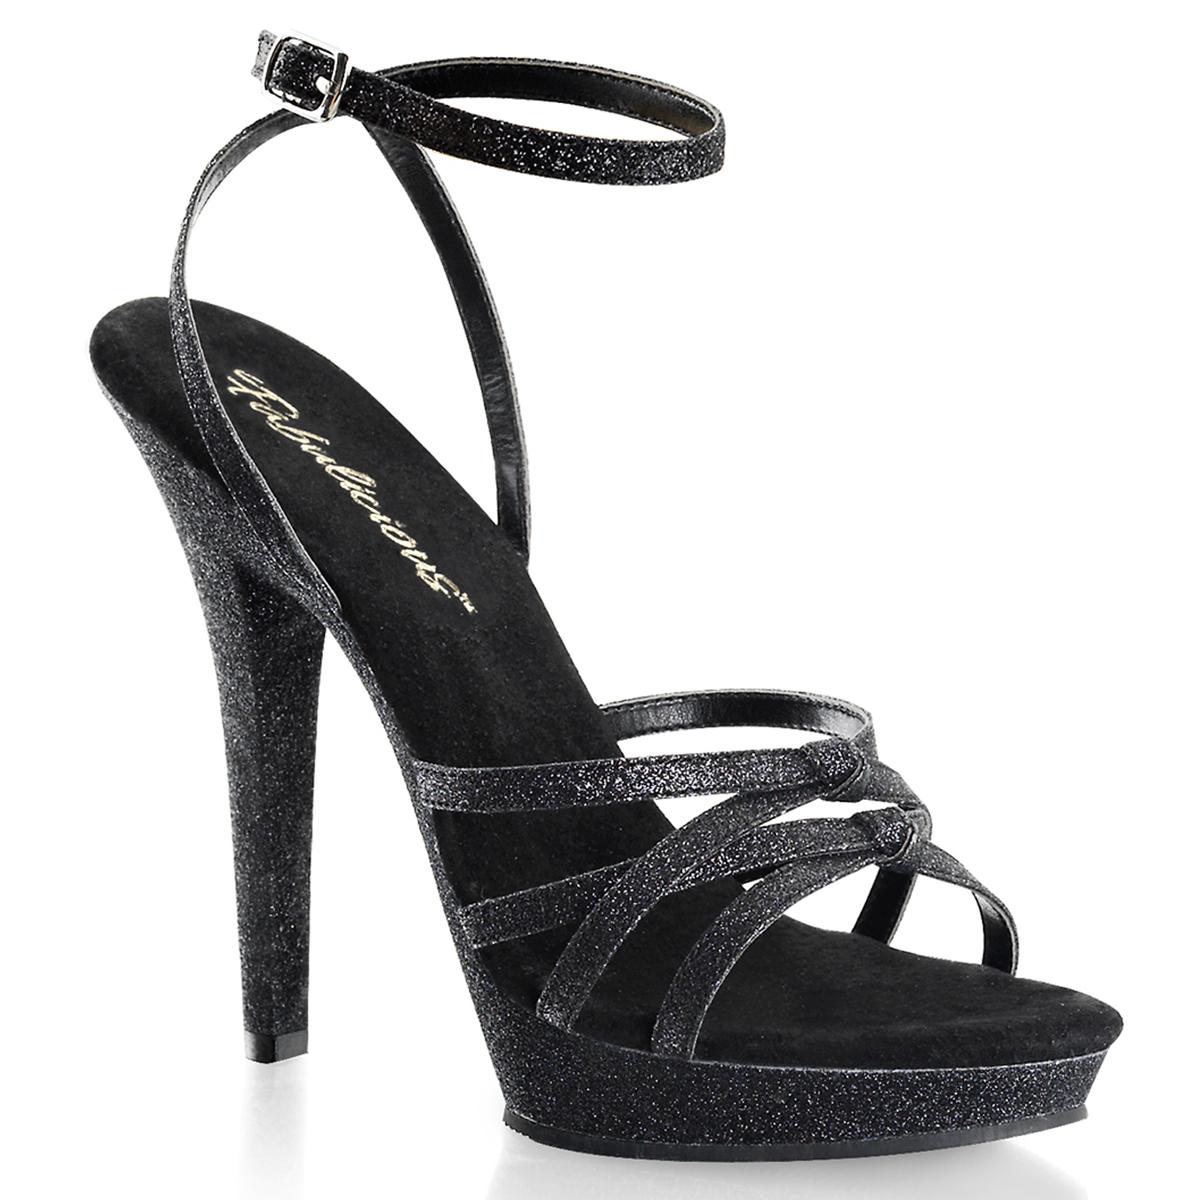 04da9bb28f1 Sandal LIP-128 - Black Glitter